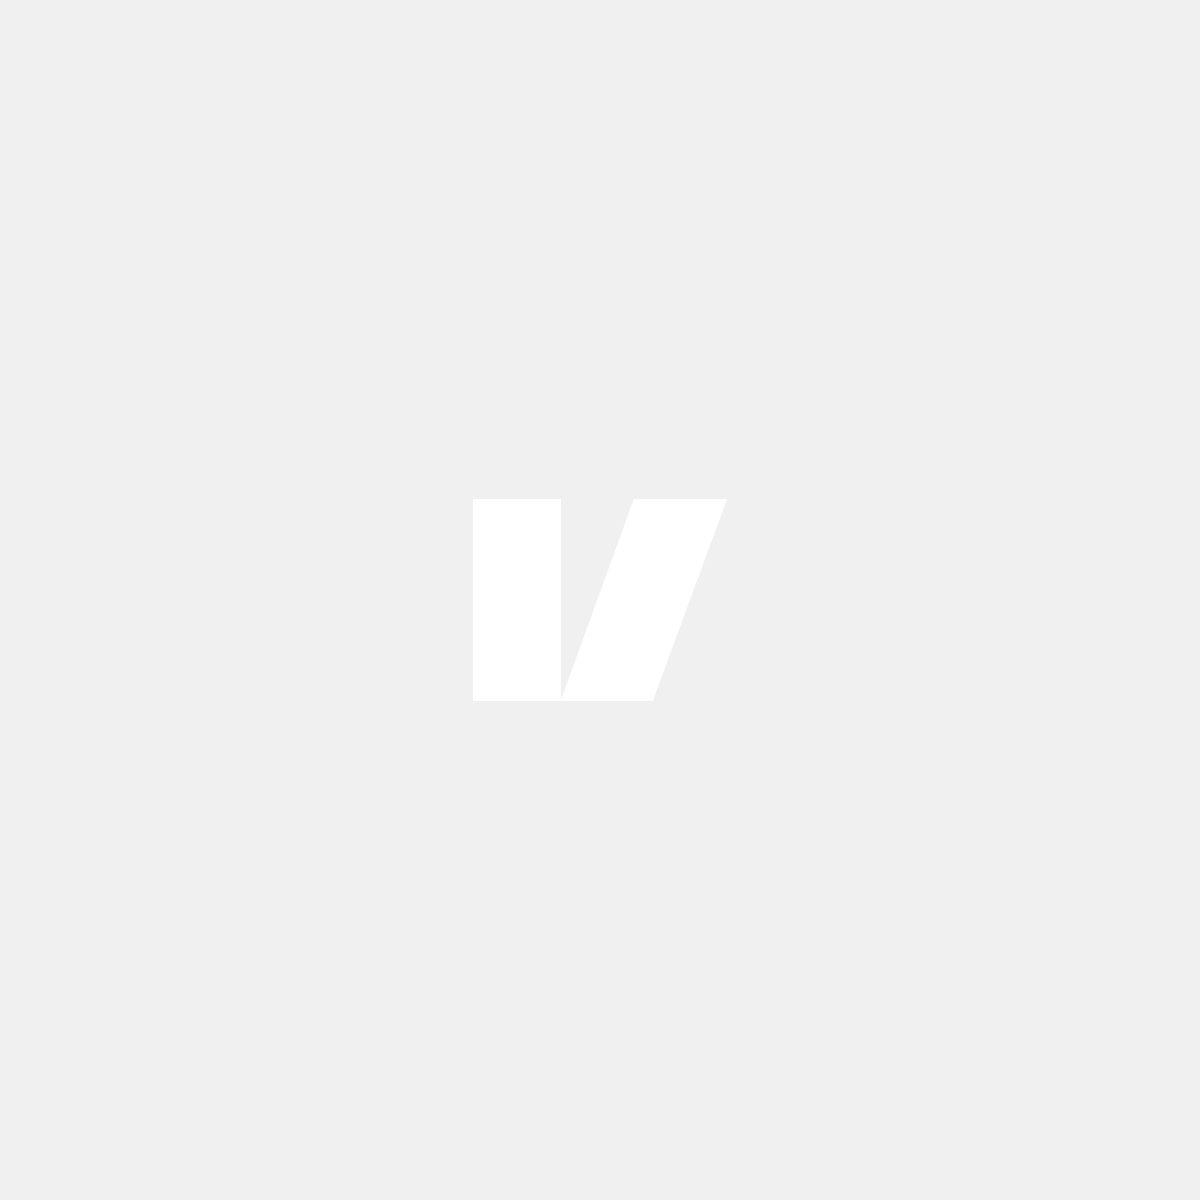 Iridium wing for the Volvo V70, XC70 00-07, carbon fiber